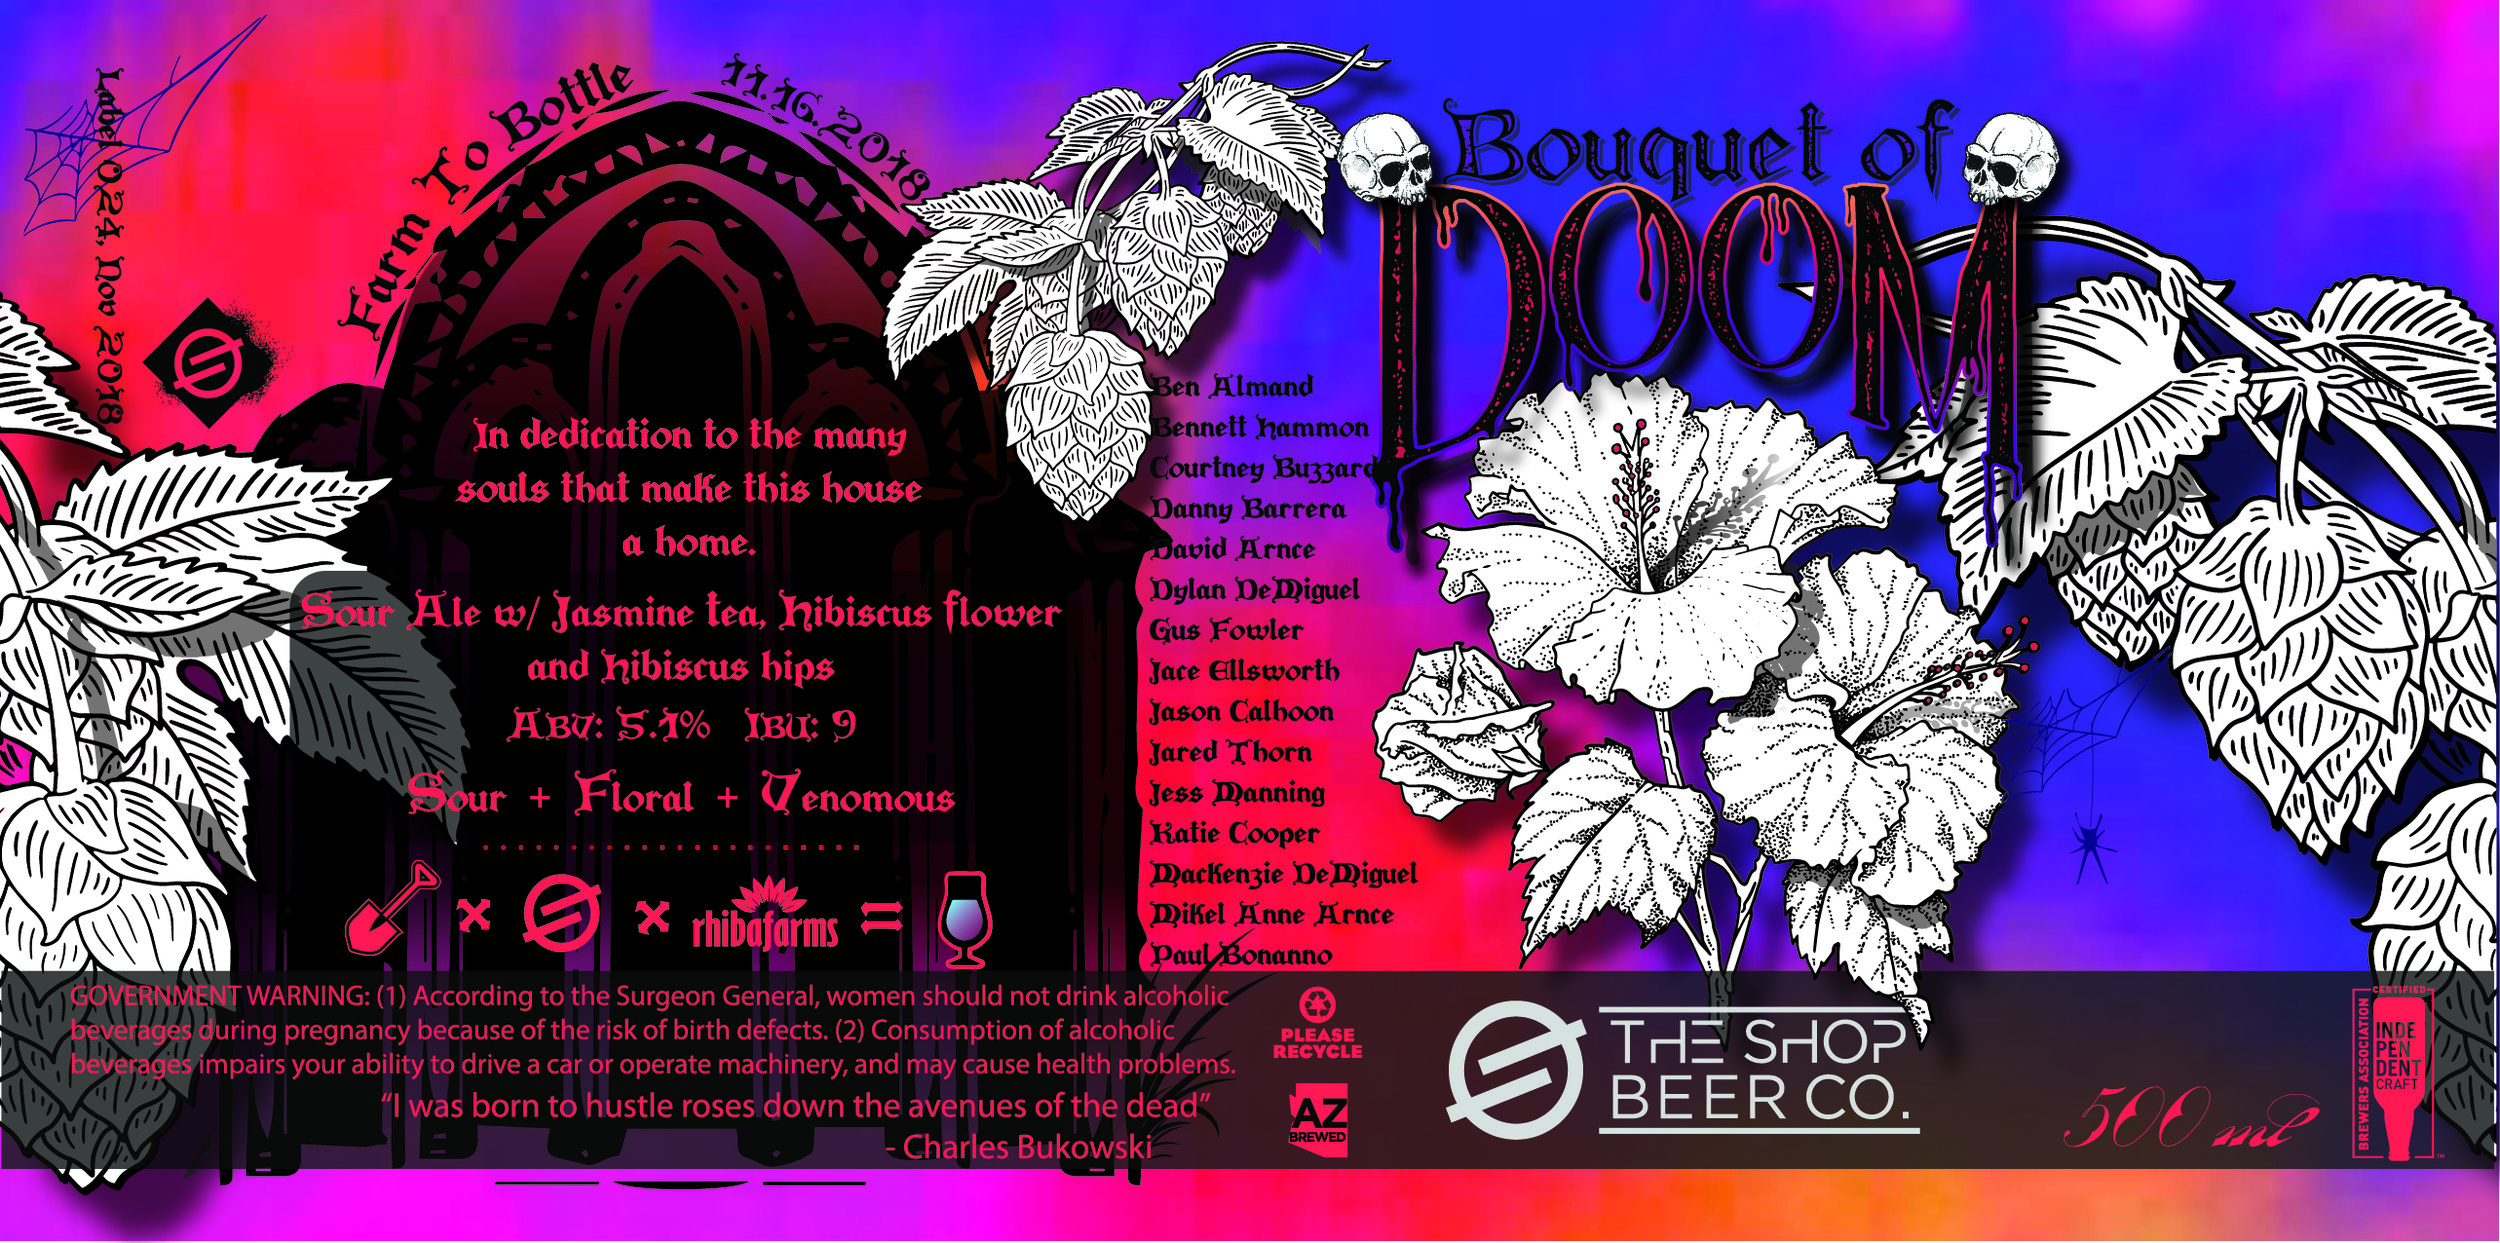 TheShopBeerCo_500ml_Bouquet of Doom_Print_11-20-18-01.jpg